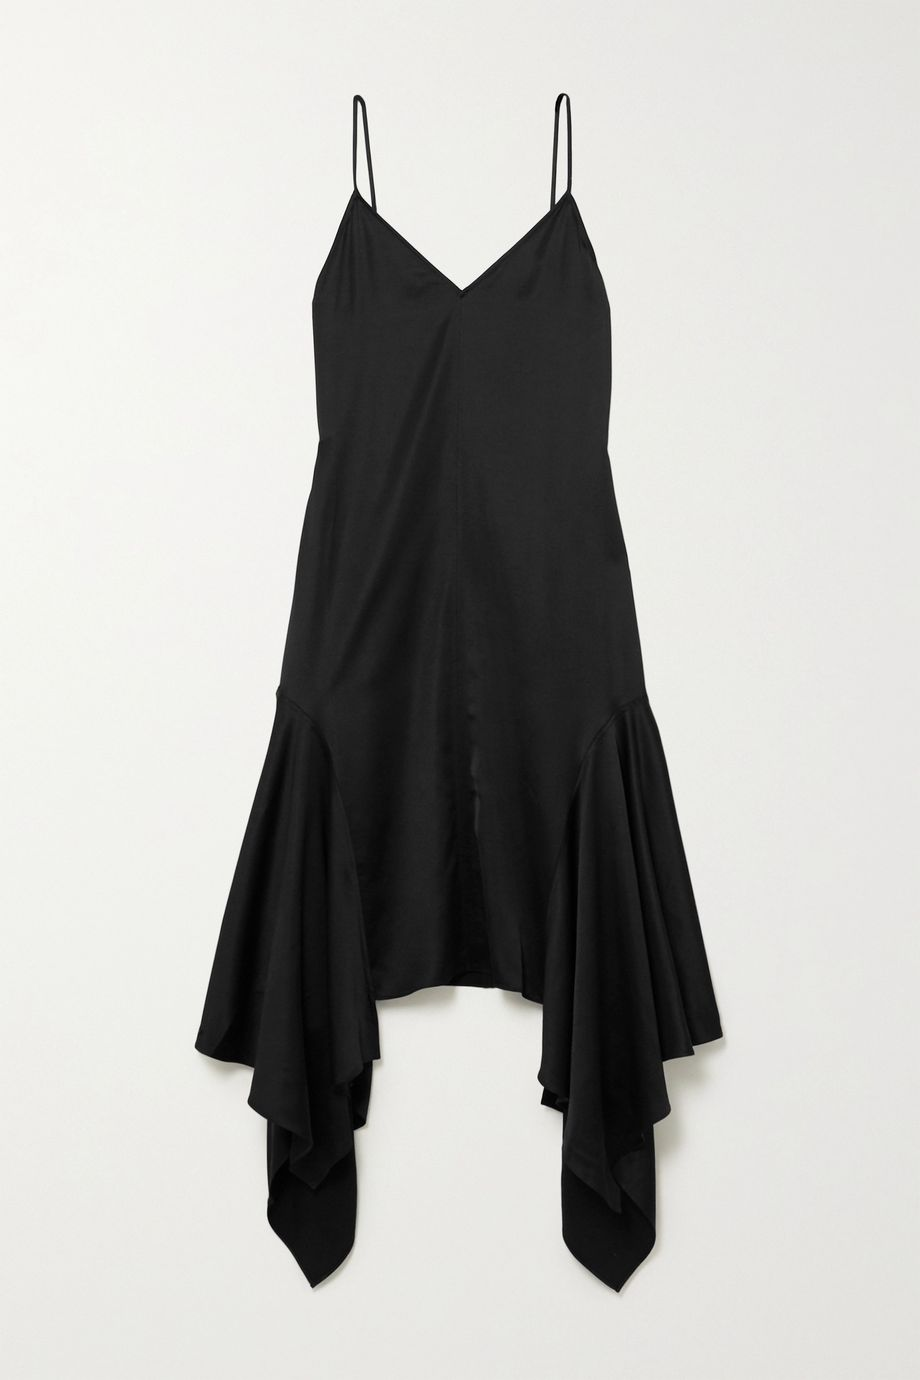 JW Anderson Asymmetric satin dress